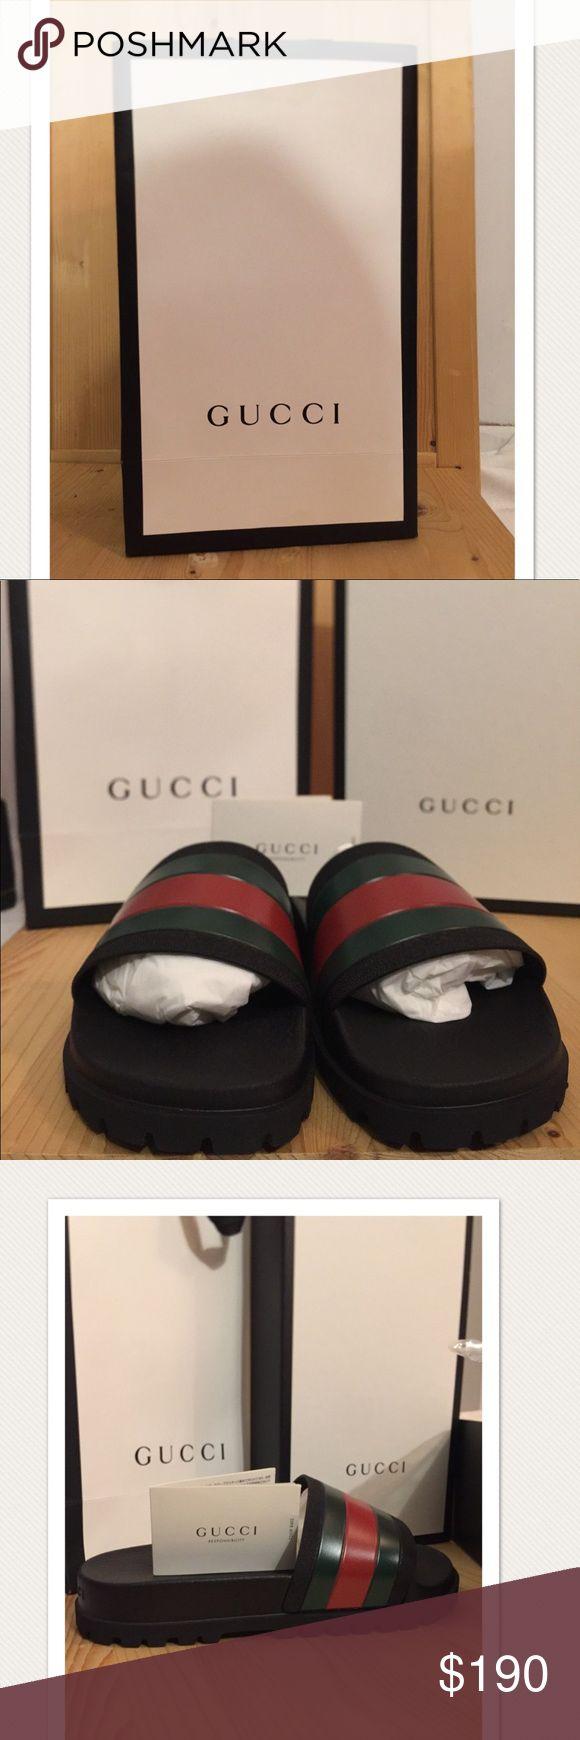 Men's Gucci shoes Men's Authentic Gucci shoes- new still in original box- price is firm Gucci Shoes Sandals & Flip-Flops